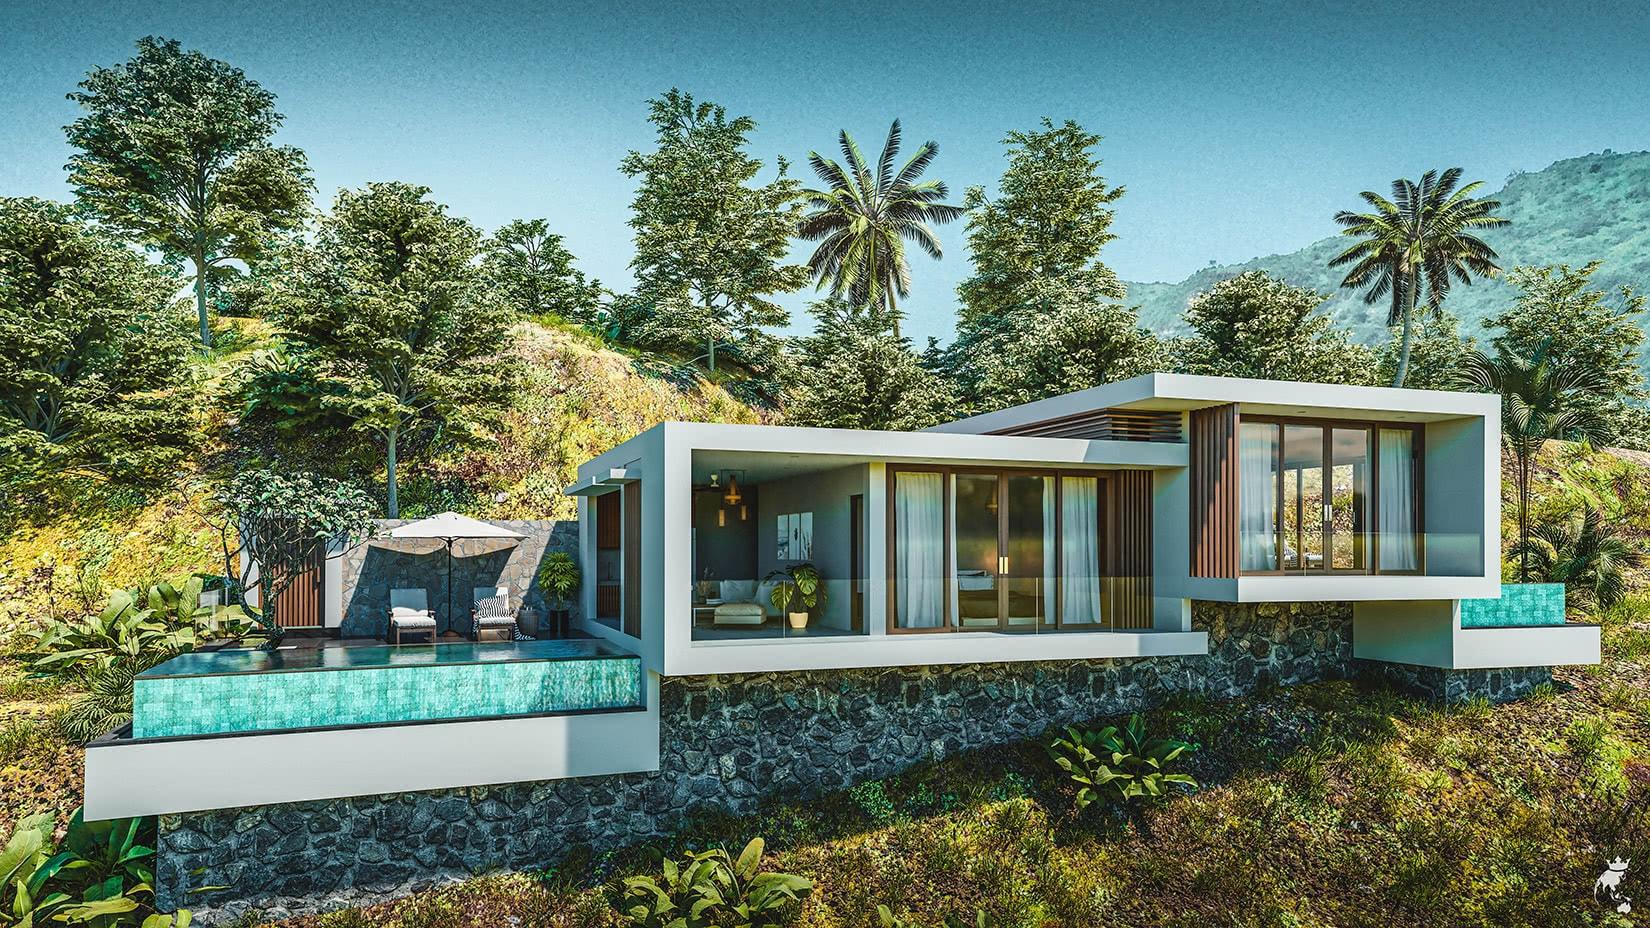 Kevin Deisser bali invest island indonesia - Luxe Digital